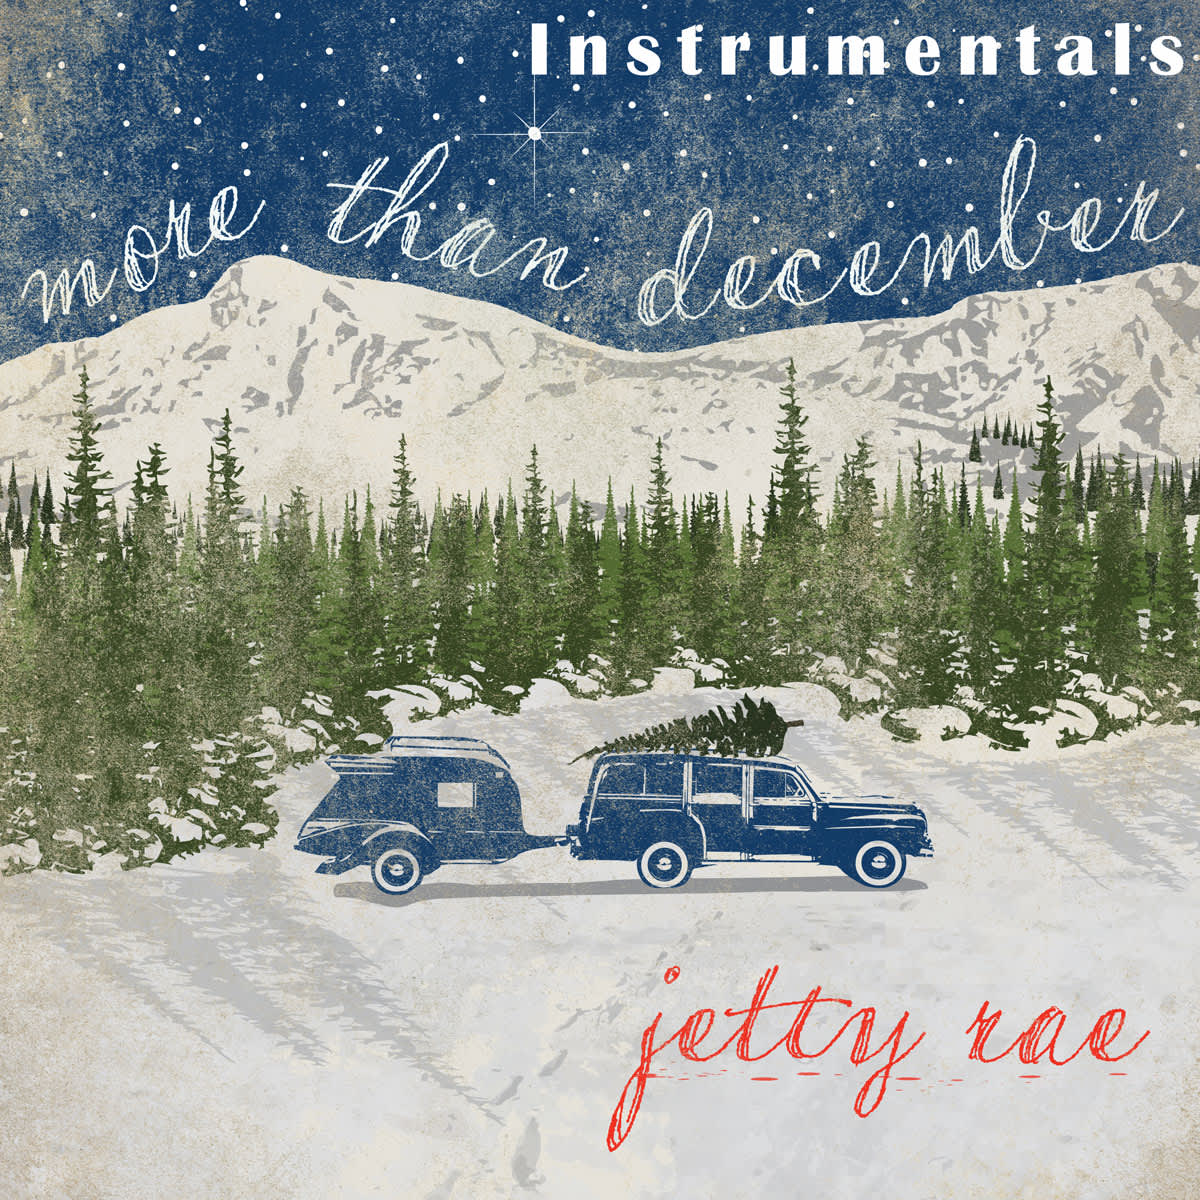 More Than December (Instrumental)